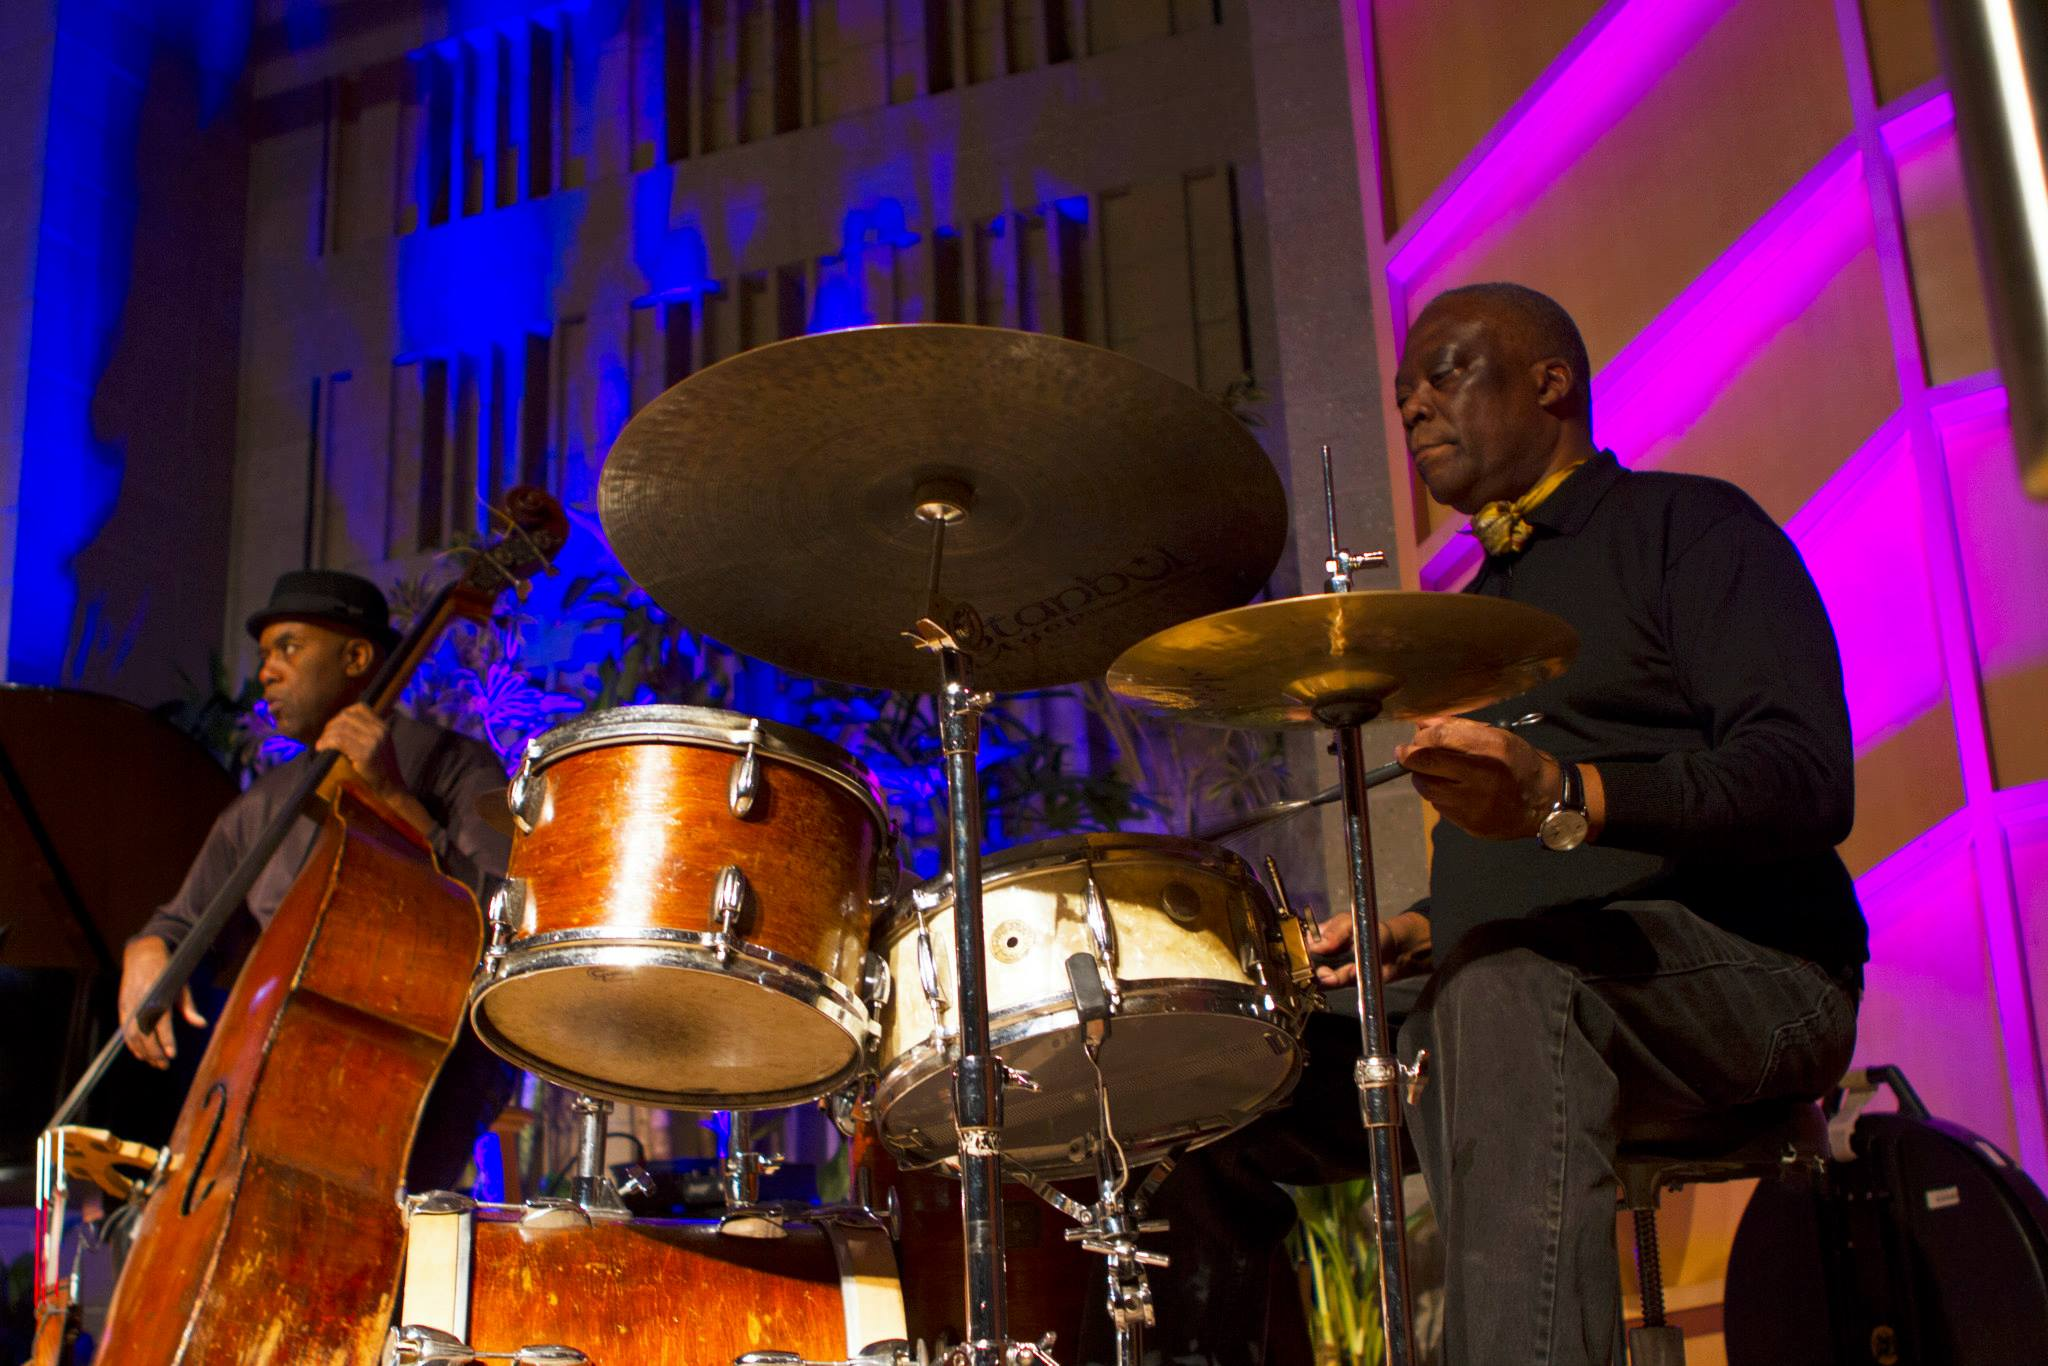 Festival 2015 Opening Night 3.19.15 Jazz Quintet by Calvin Rong, The Ticker.jpg